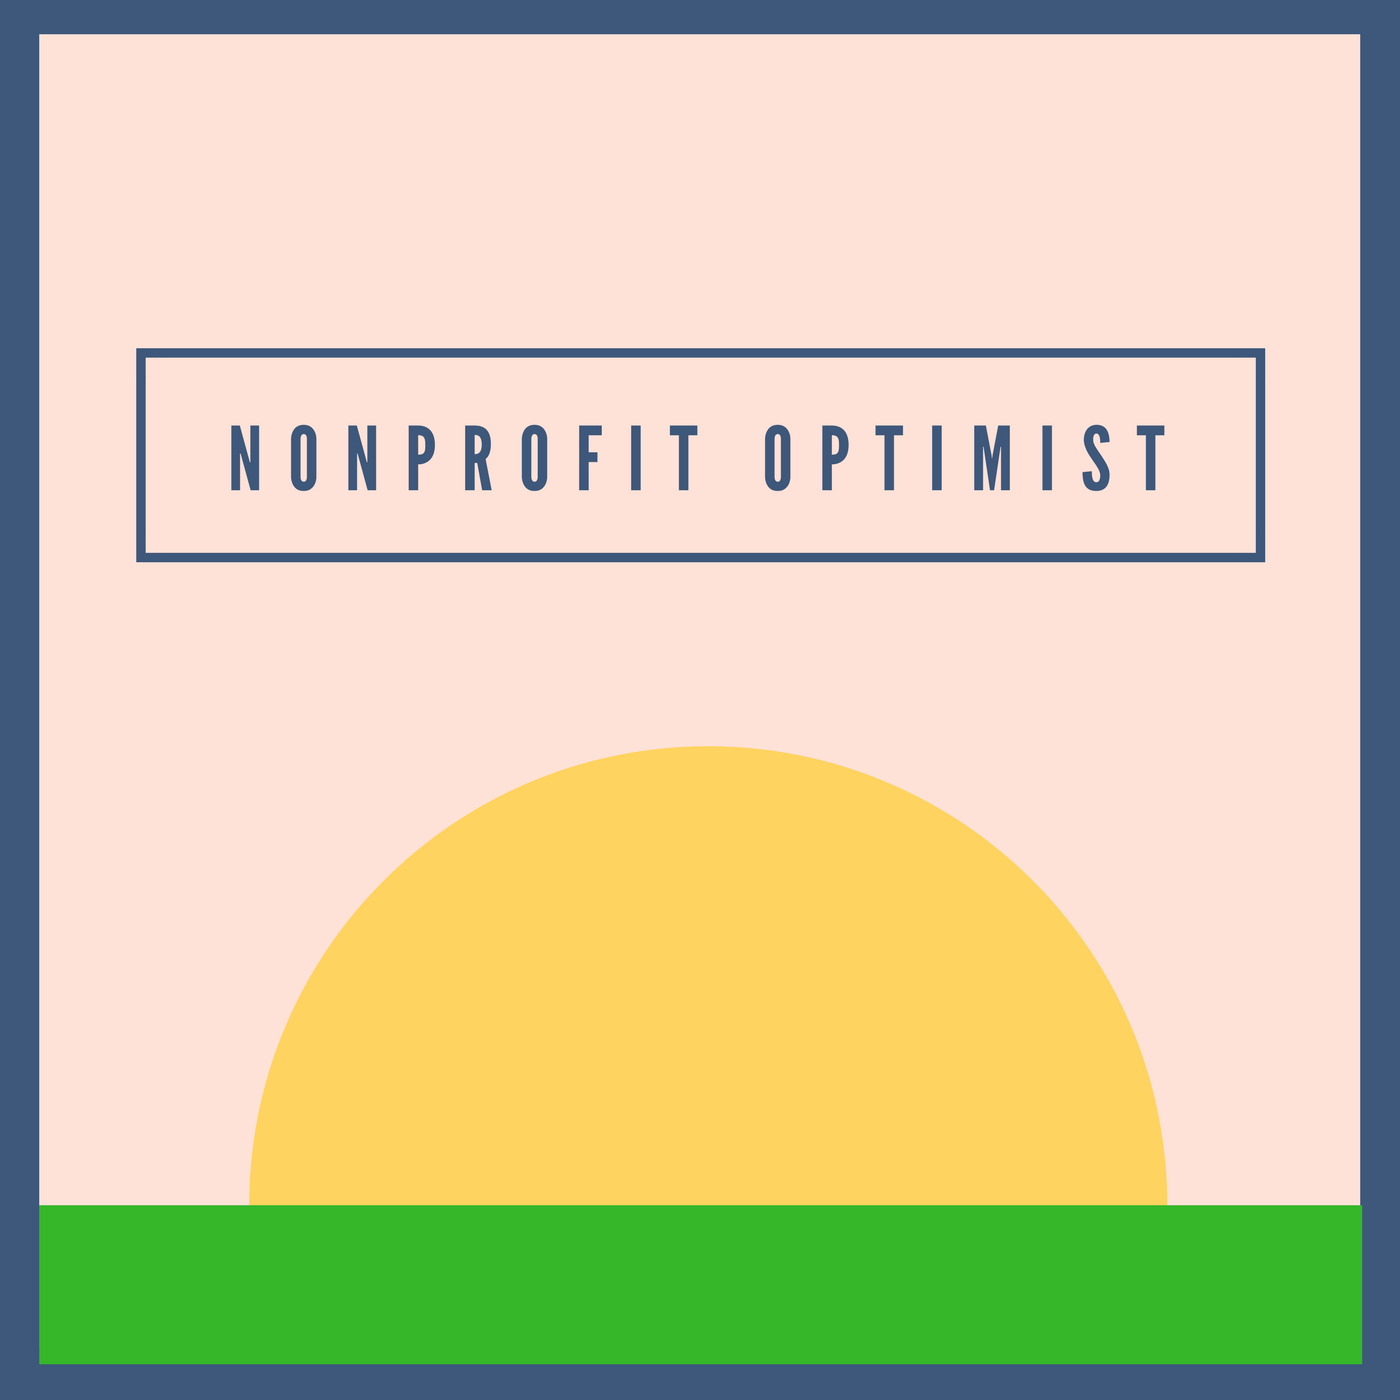 NonProfitOptimist.png